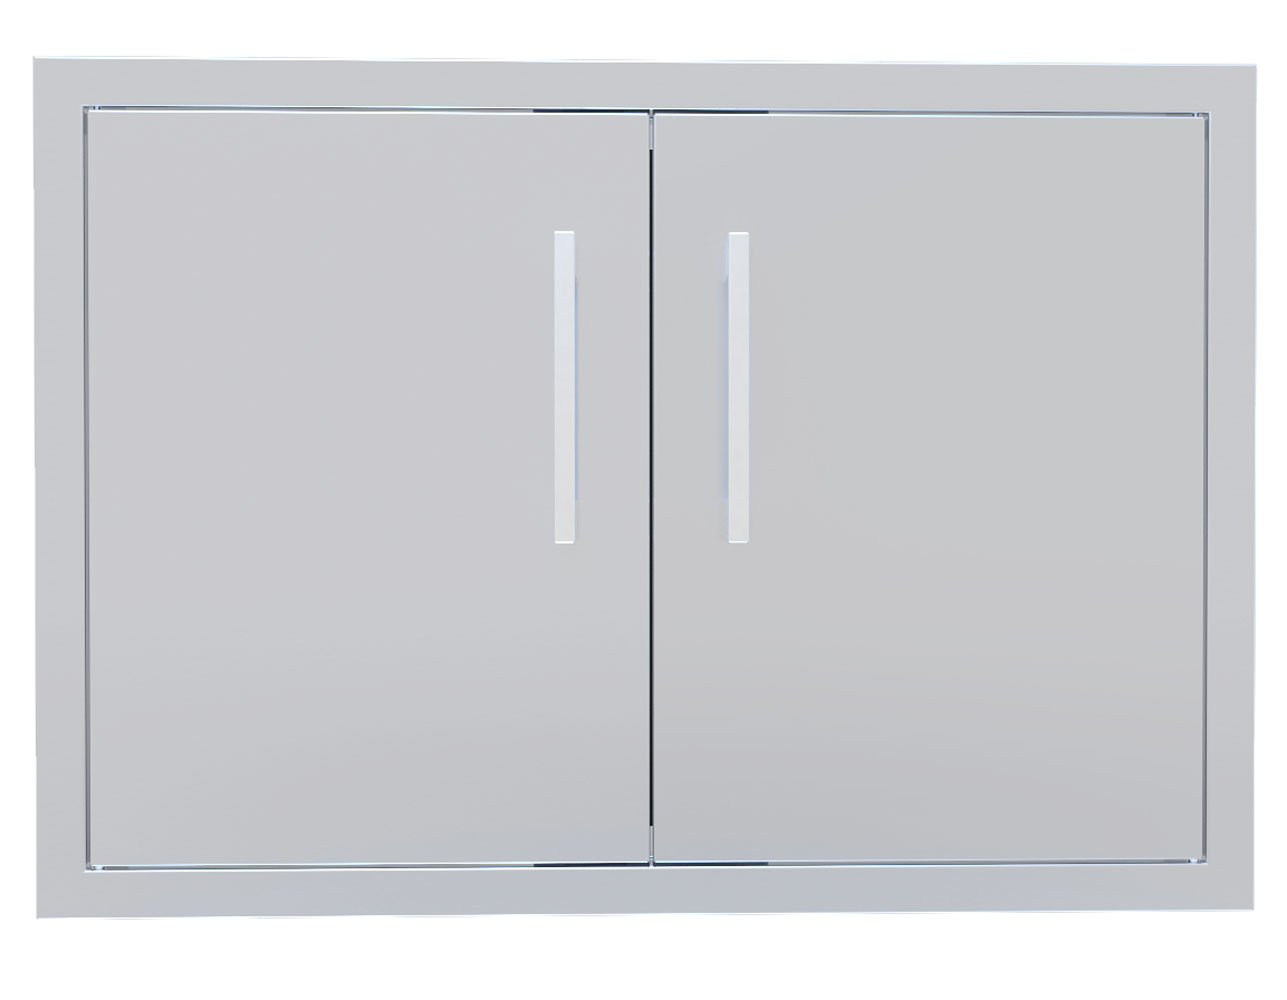 Sunstone BA-DD30 Beveled Frame Double Access Door, 30''